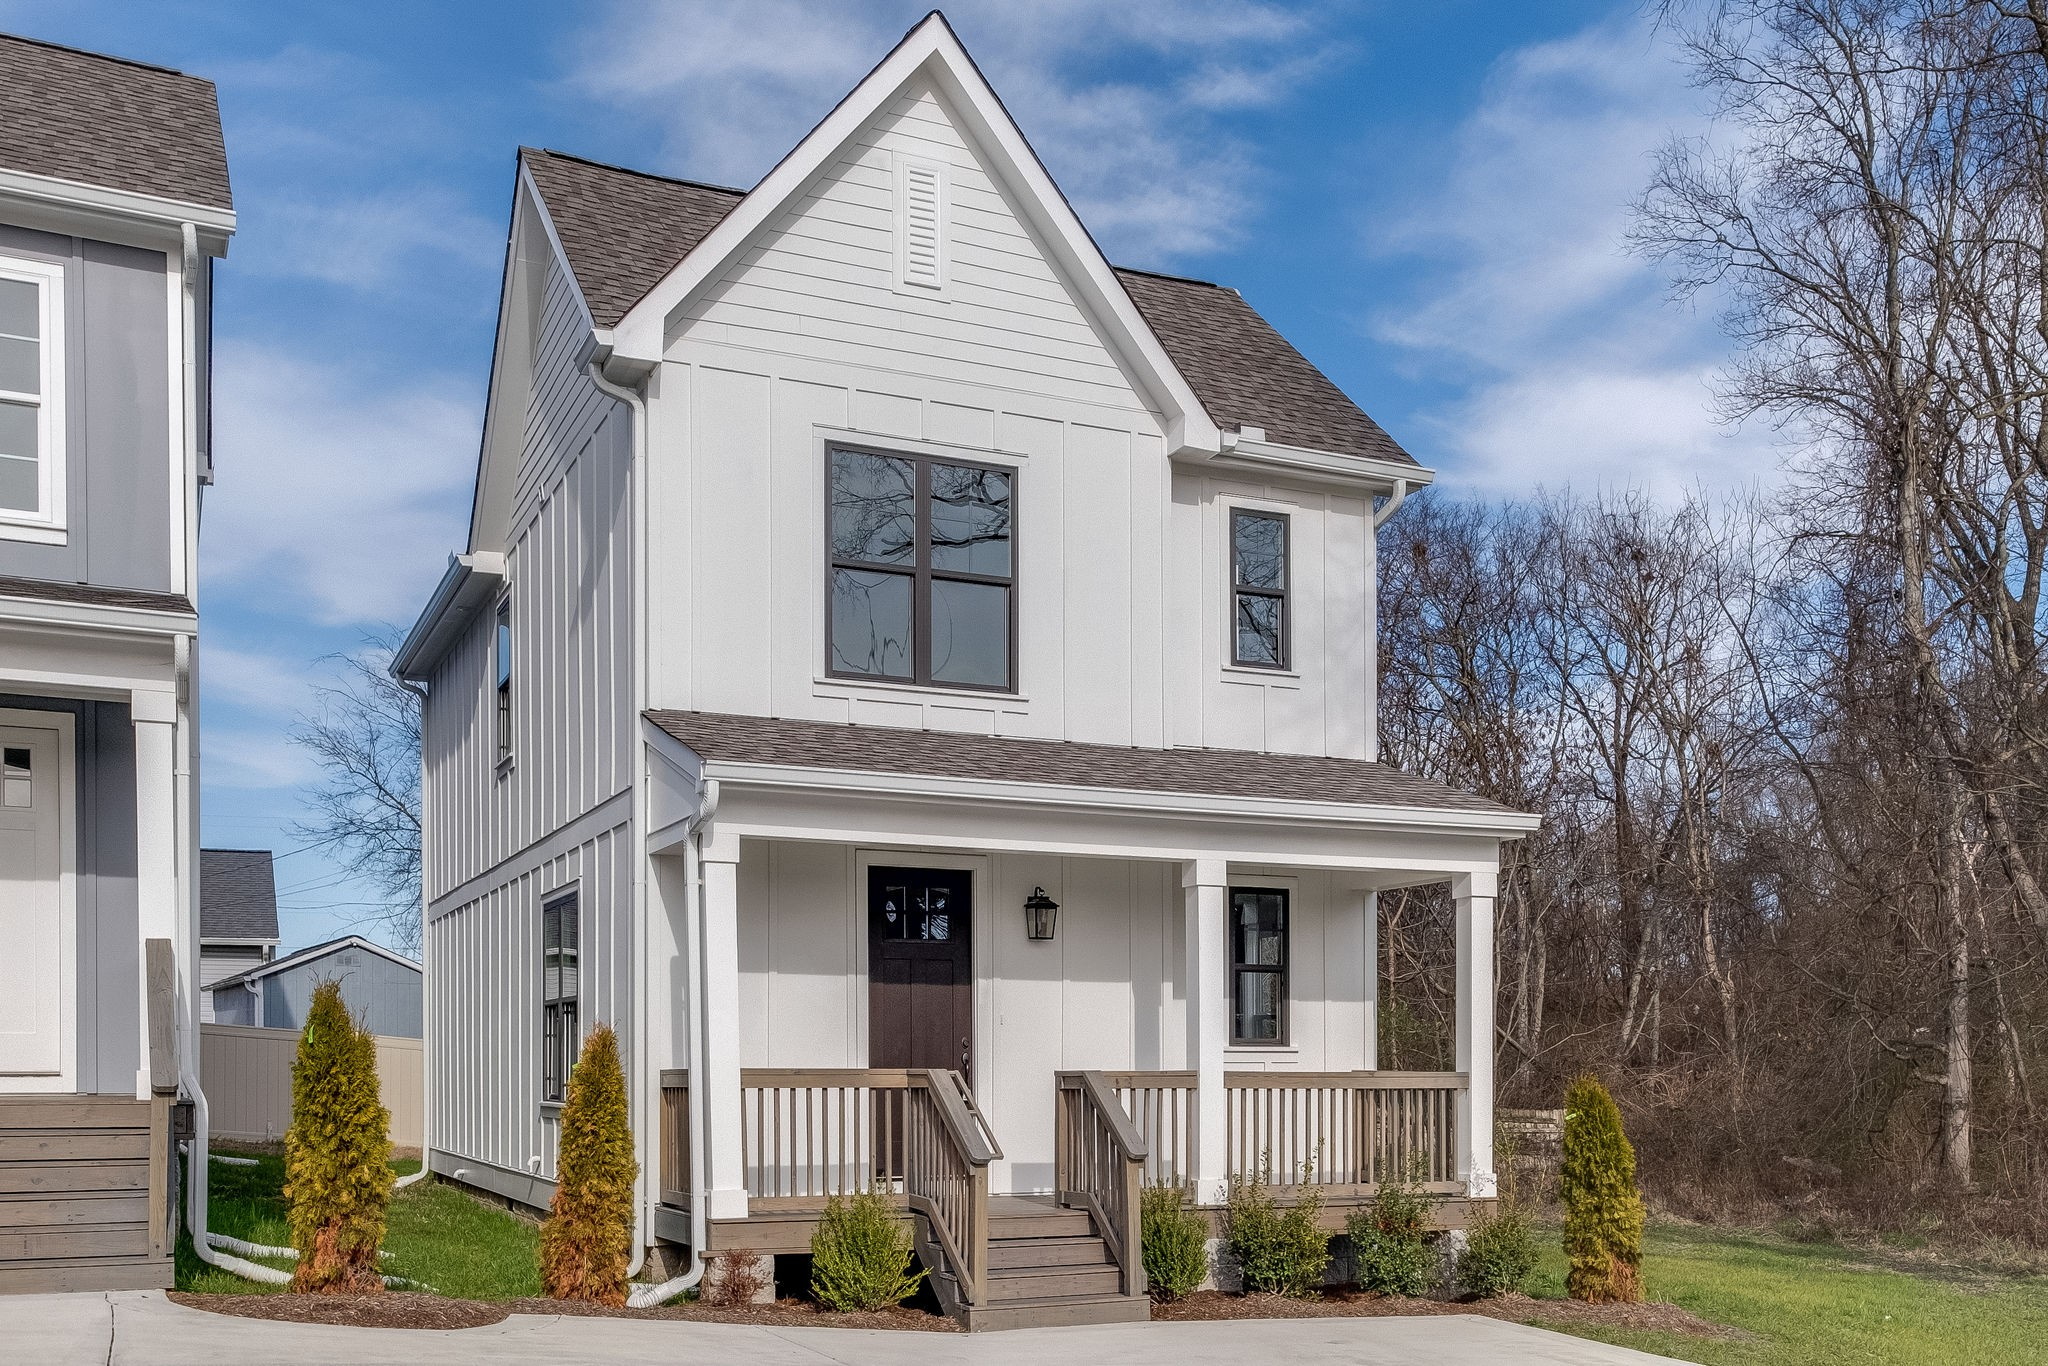 6116B Robertson Ave, Nashville, TN 37209 - Nashville, TN real estate listing